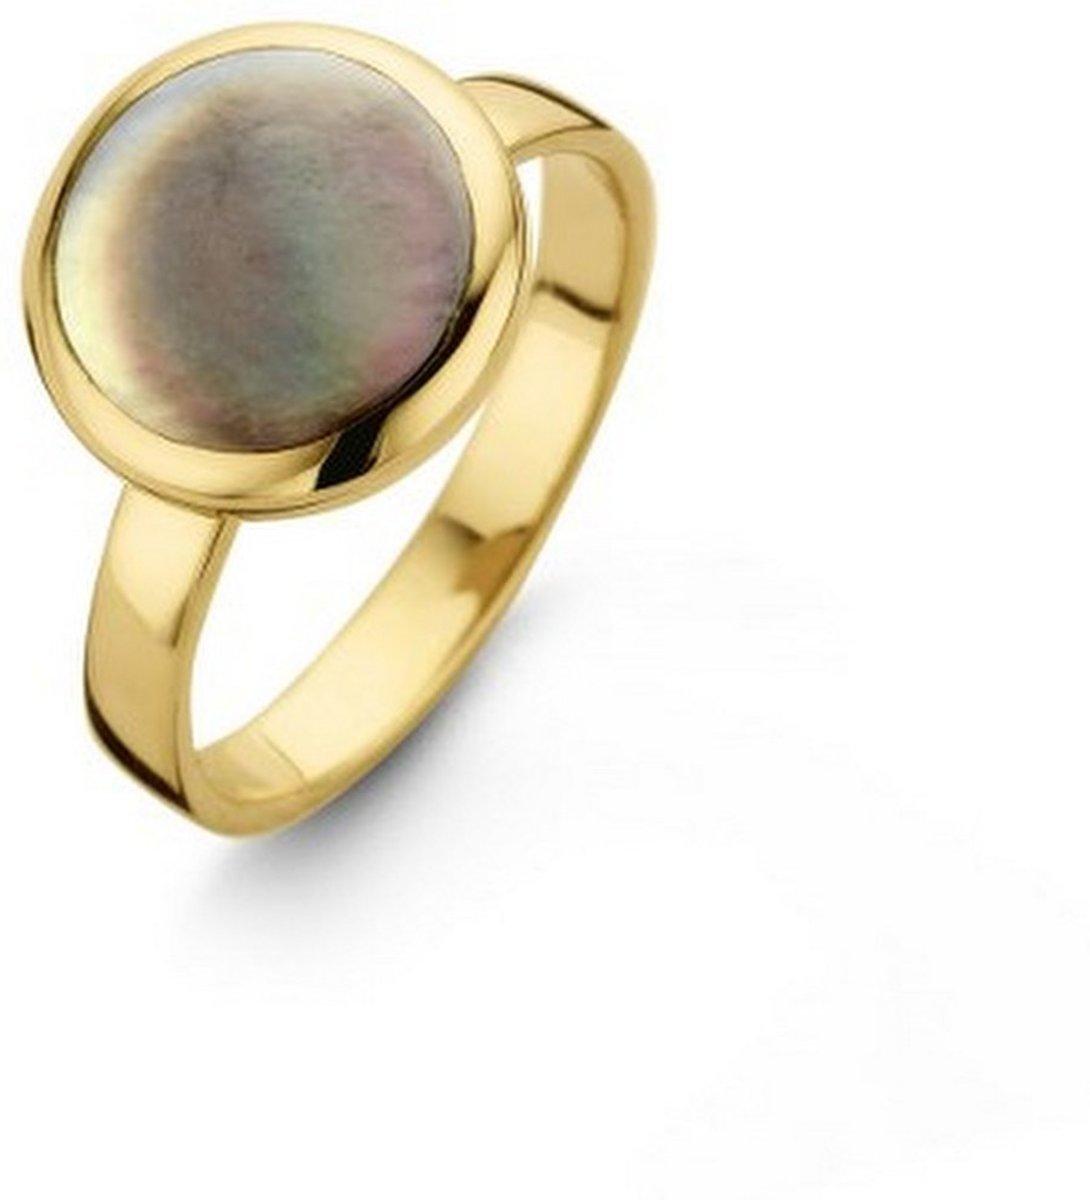 Casa Jewelry Ring Pom Grey L 54 - Goud Verguld kopen